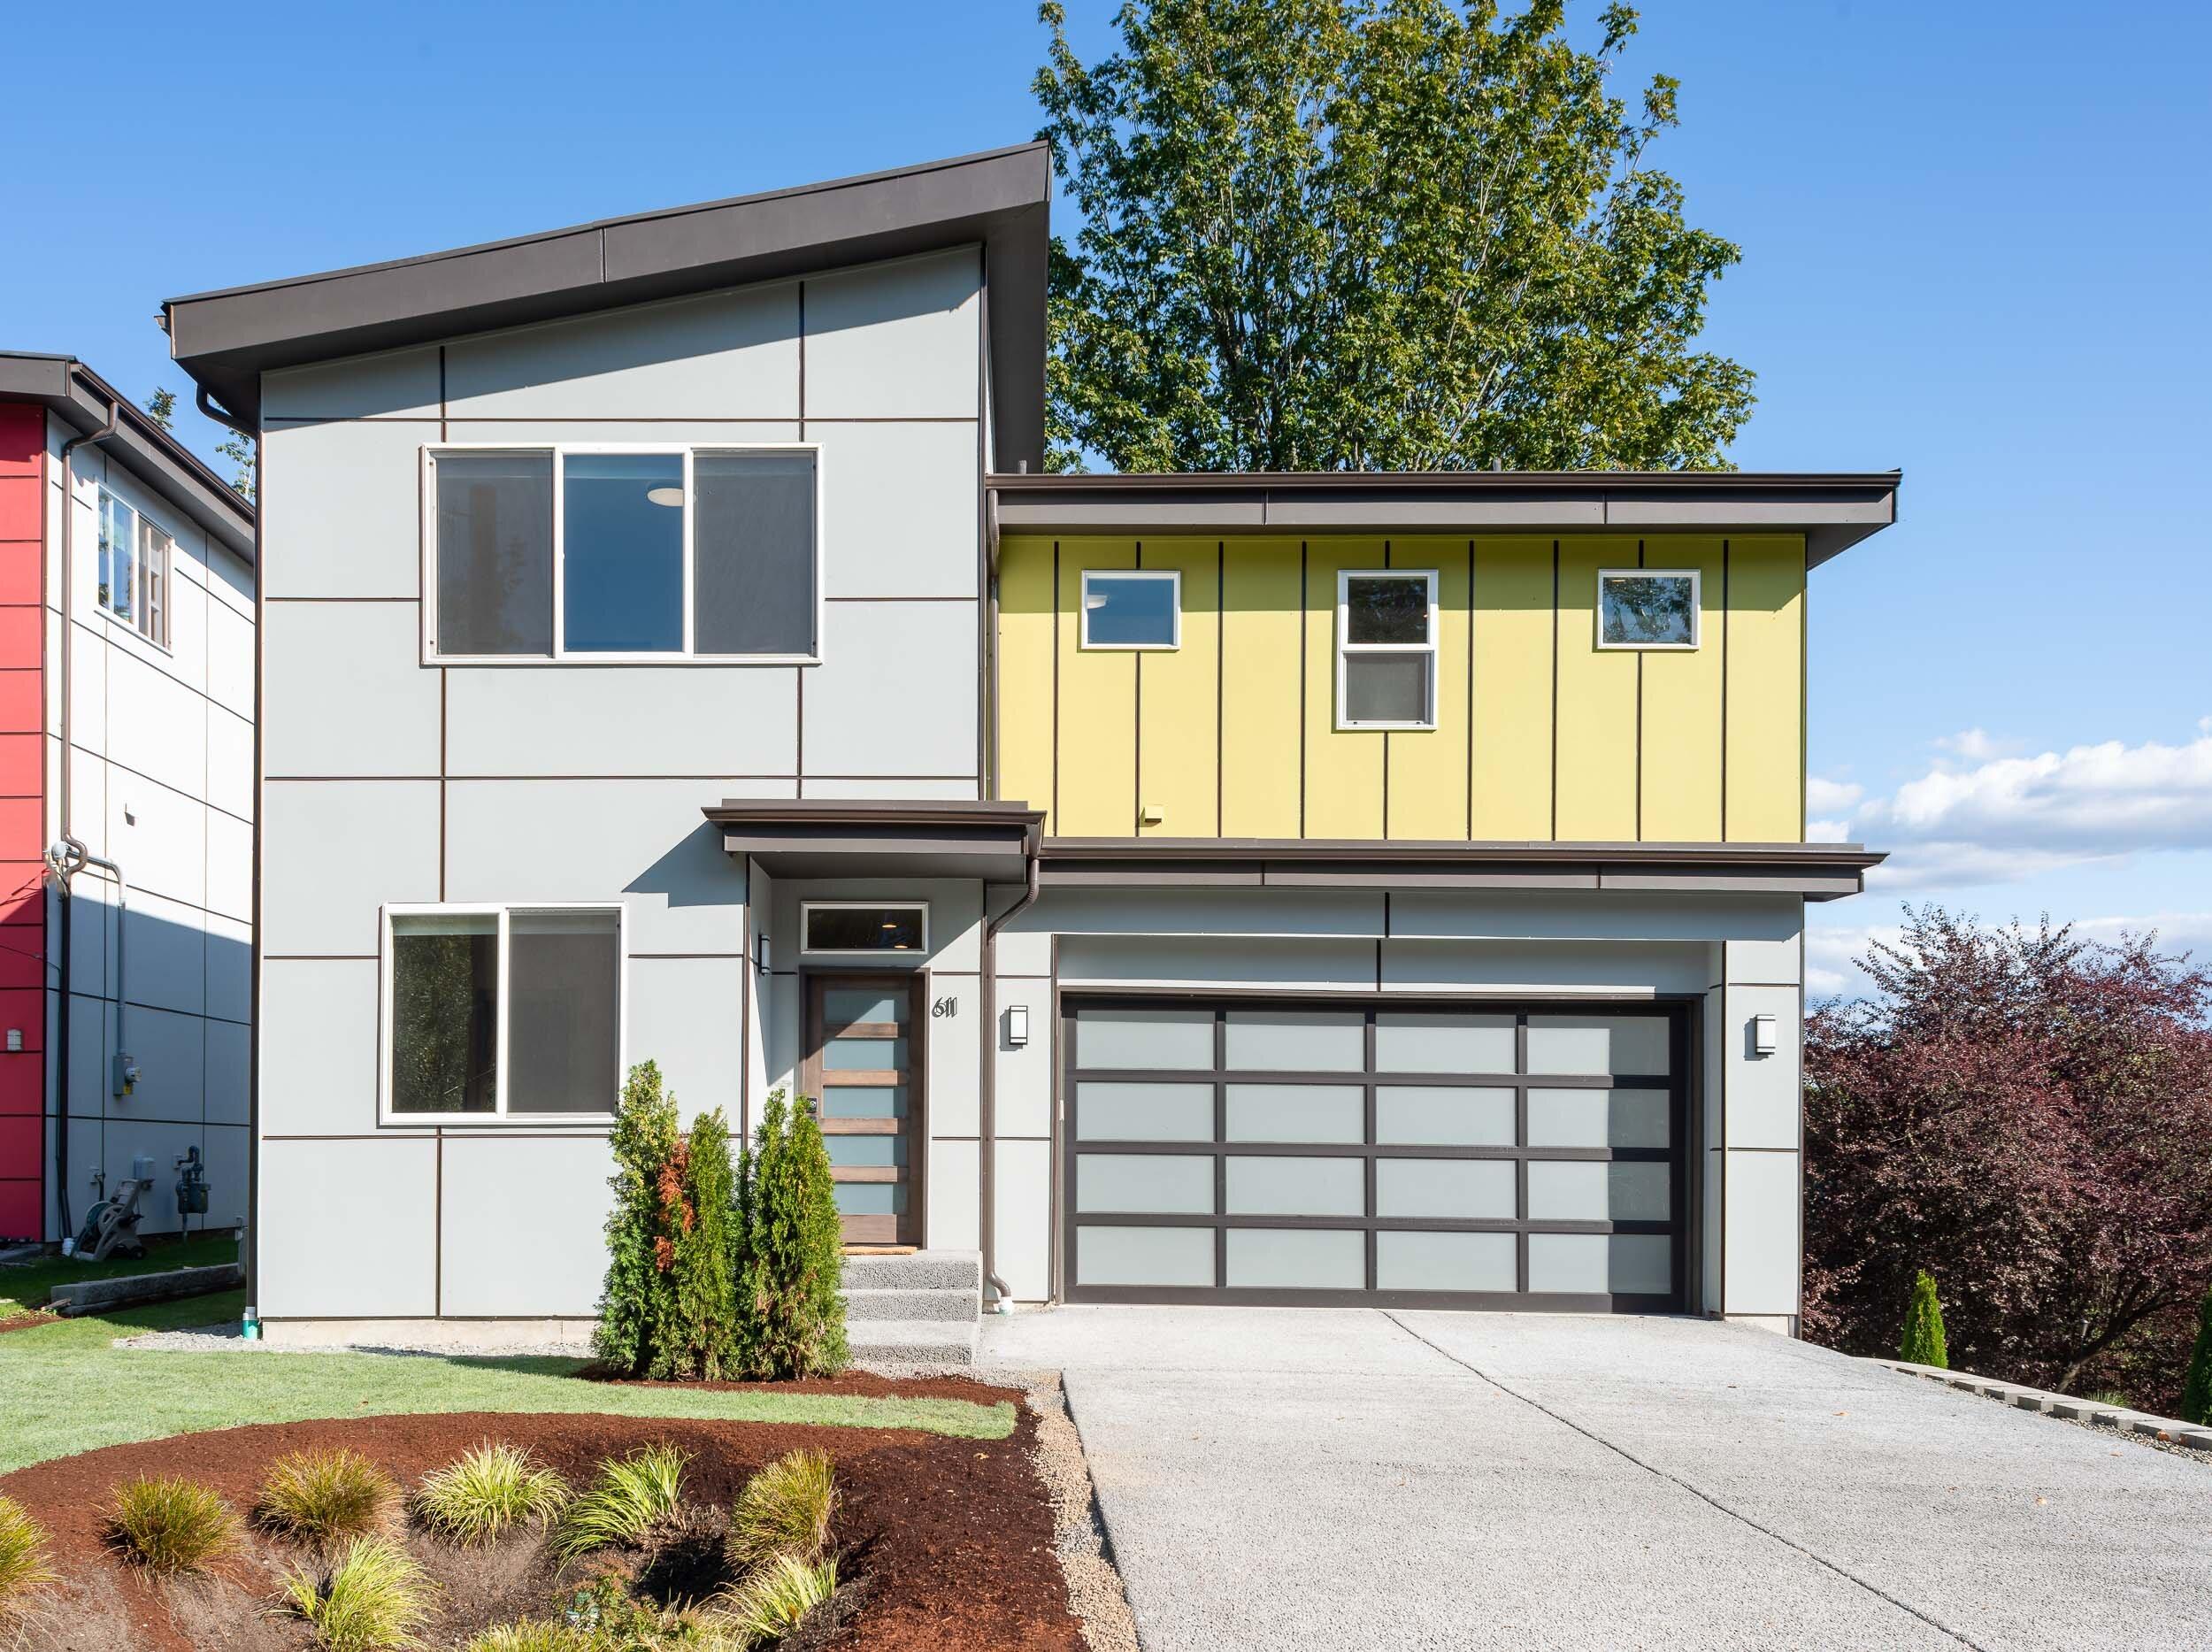 PENDING: West Seattle Modern New Construction - $845,000 | BR: 4 | BA: 2.5 | 2,400 SQ. FT.